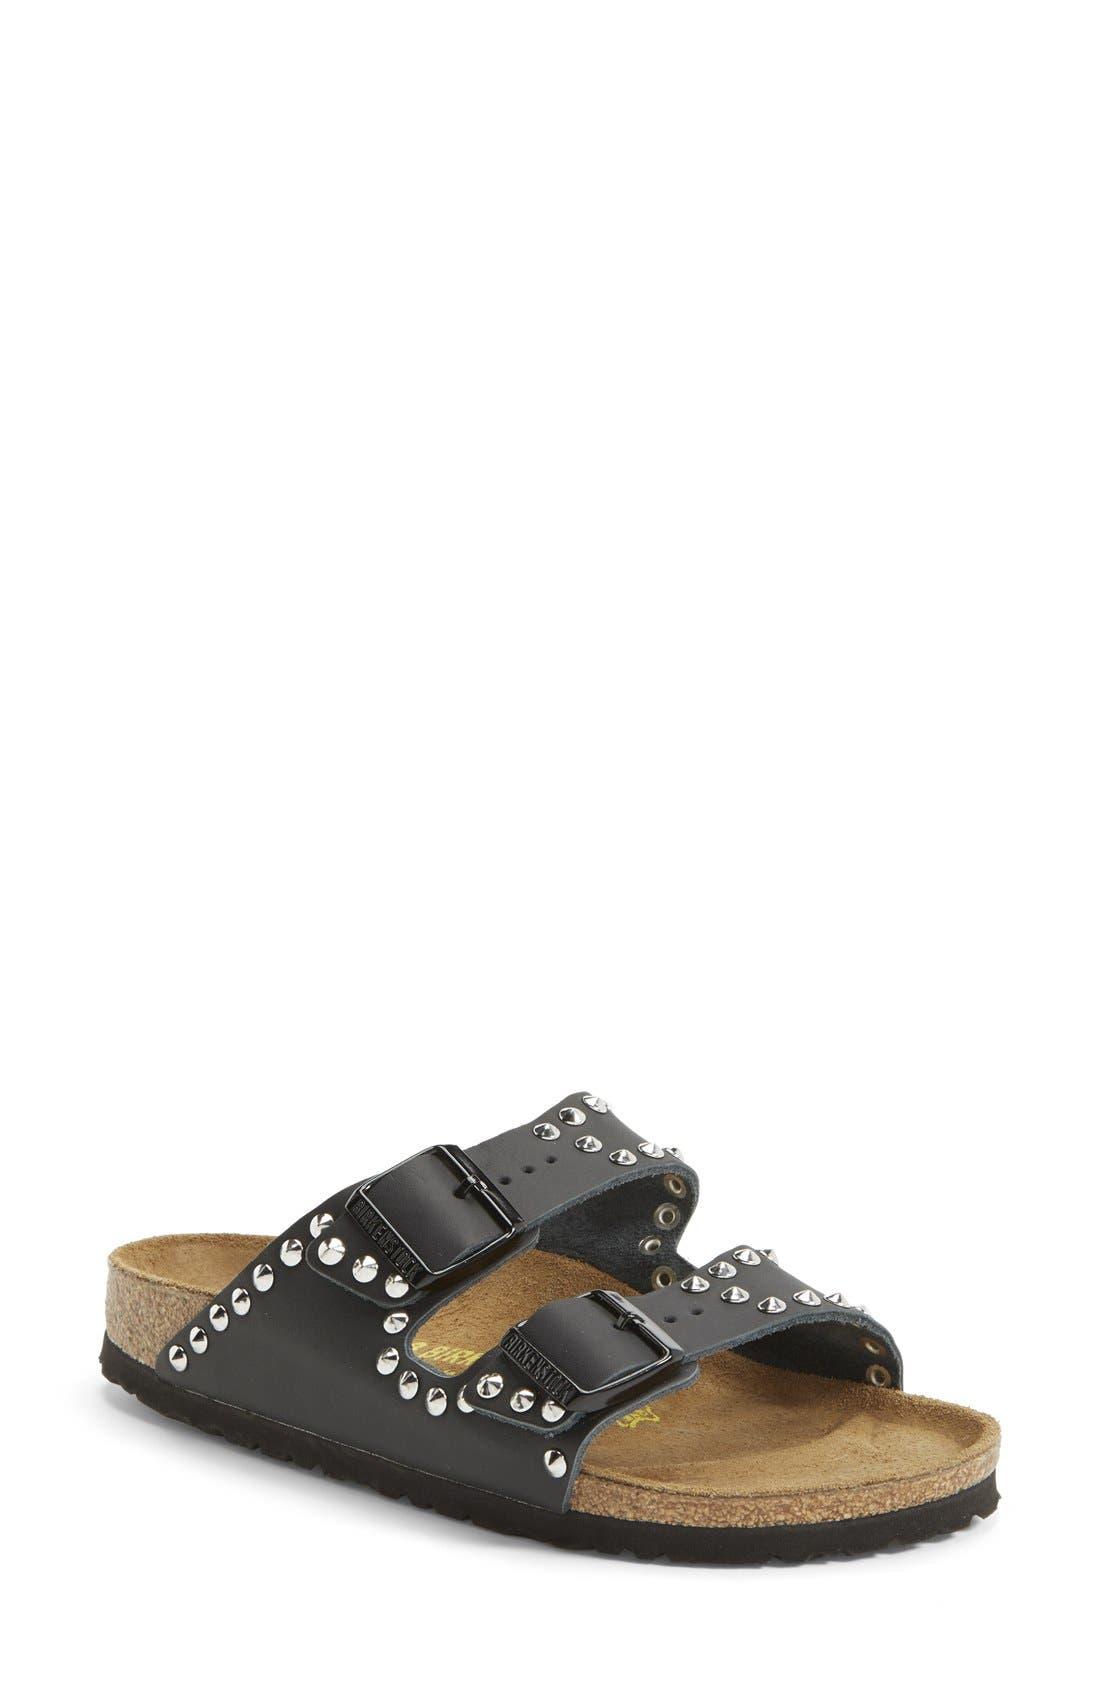 Alternate Image 1 Selected - Birkenstock 'Arizona' Studded Leather Sandal (Women)